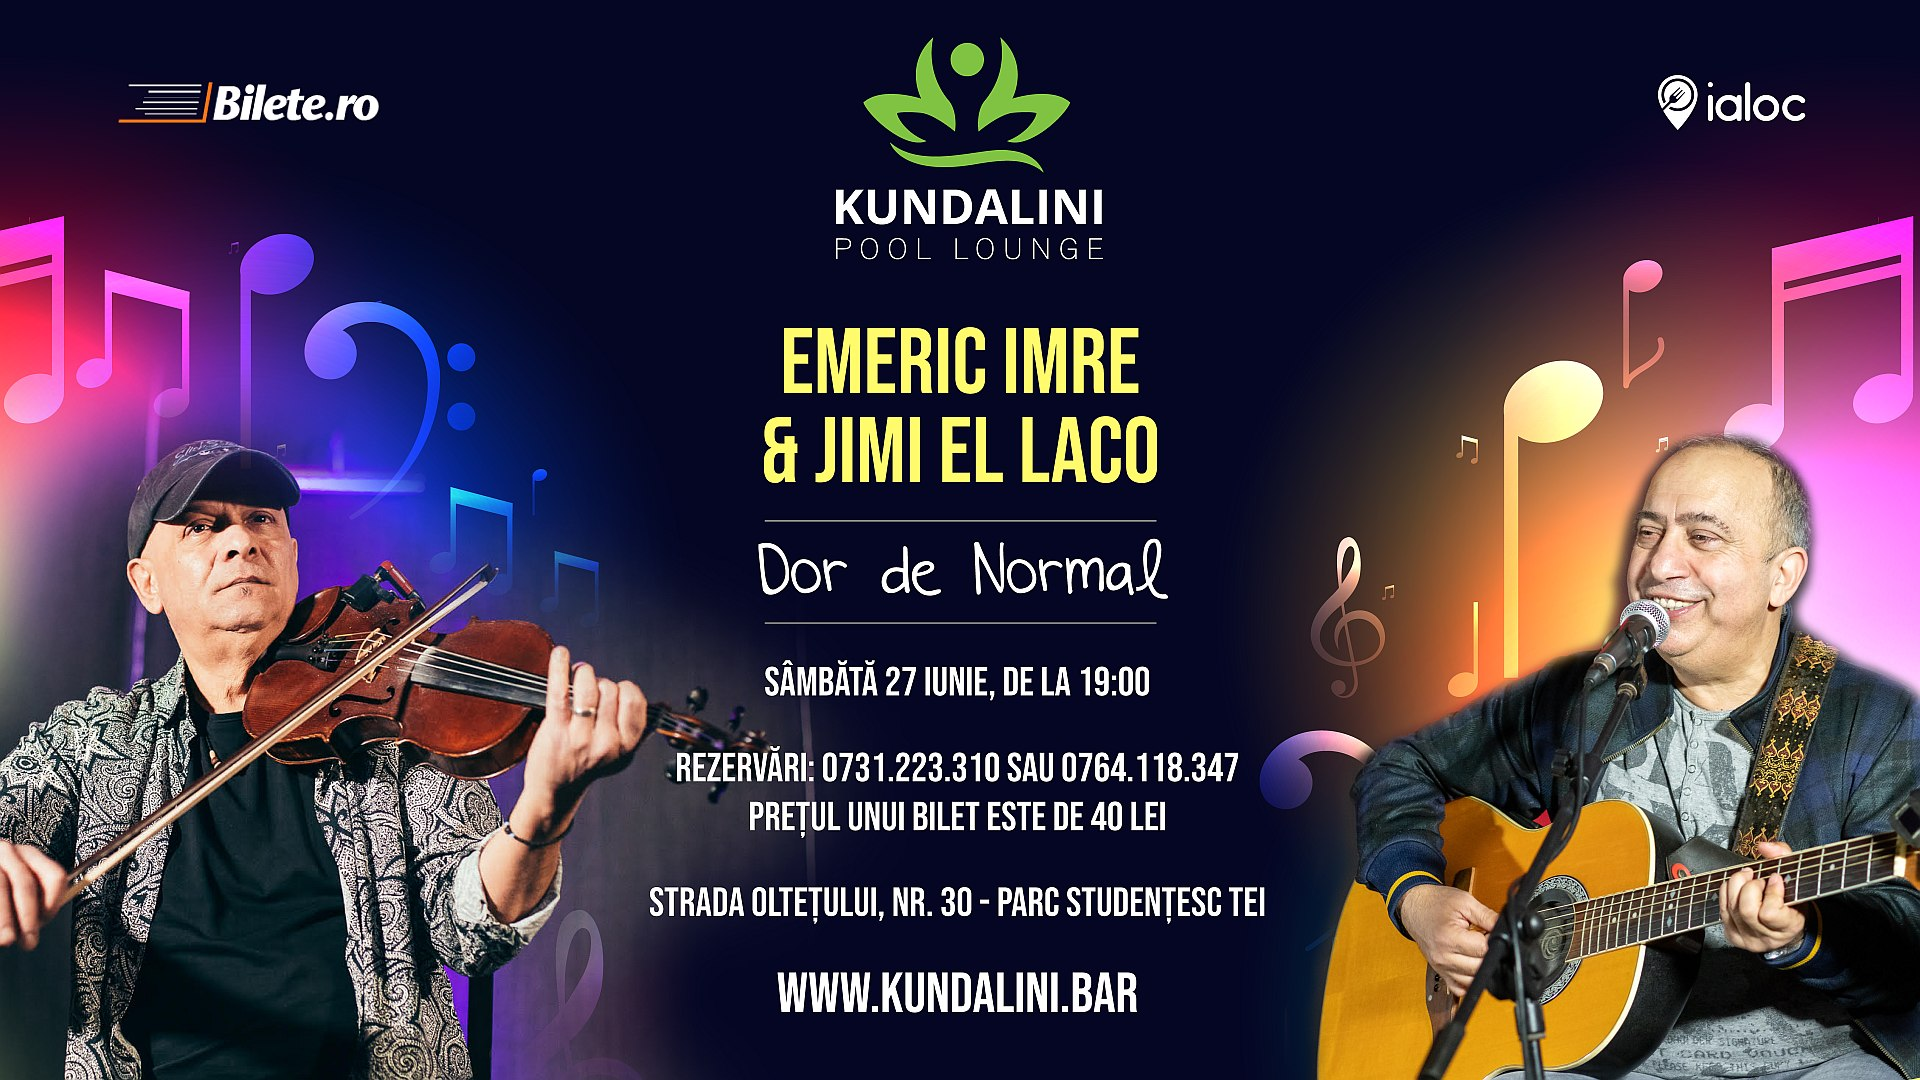 Emeric Imre & Jimi El Laco @ Kundalini